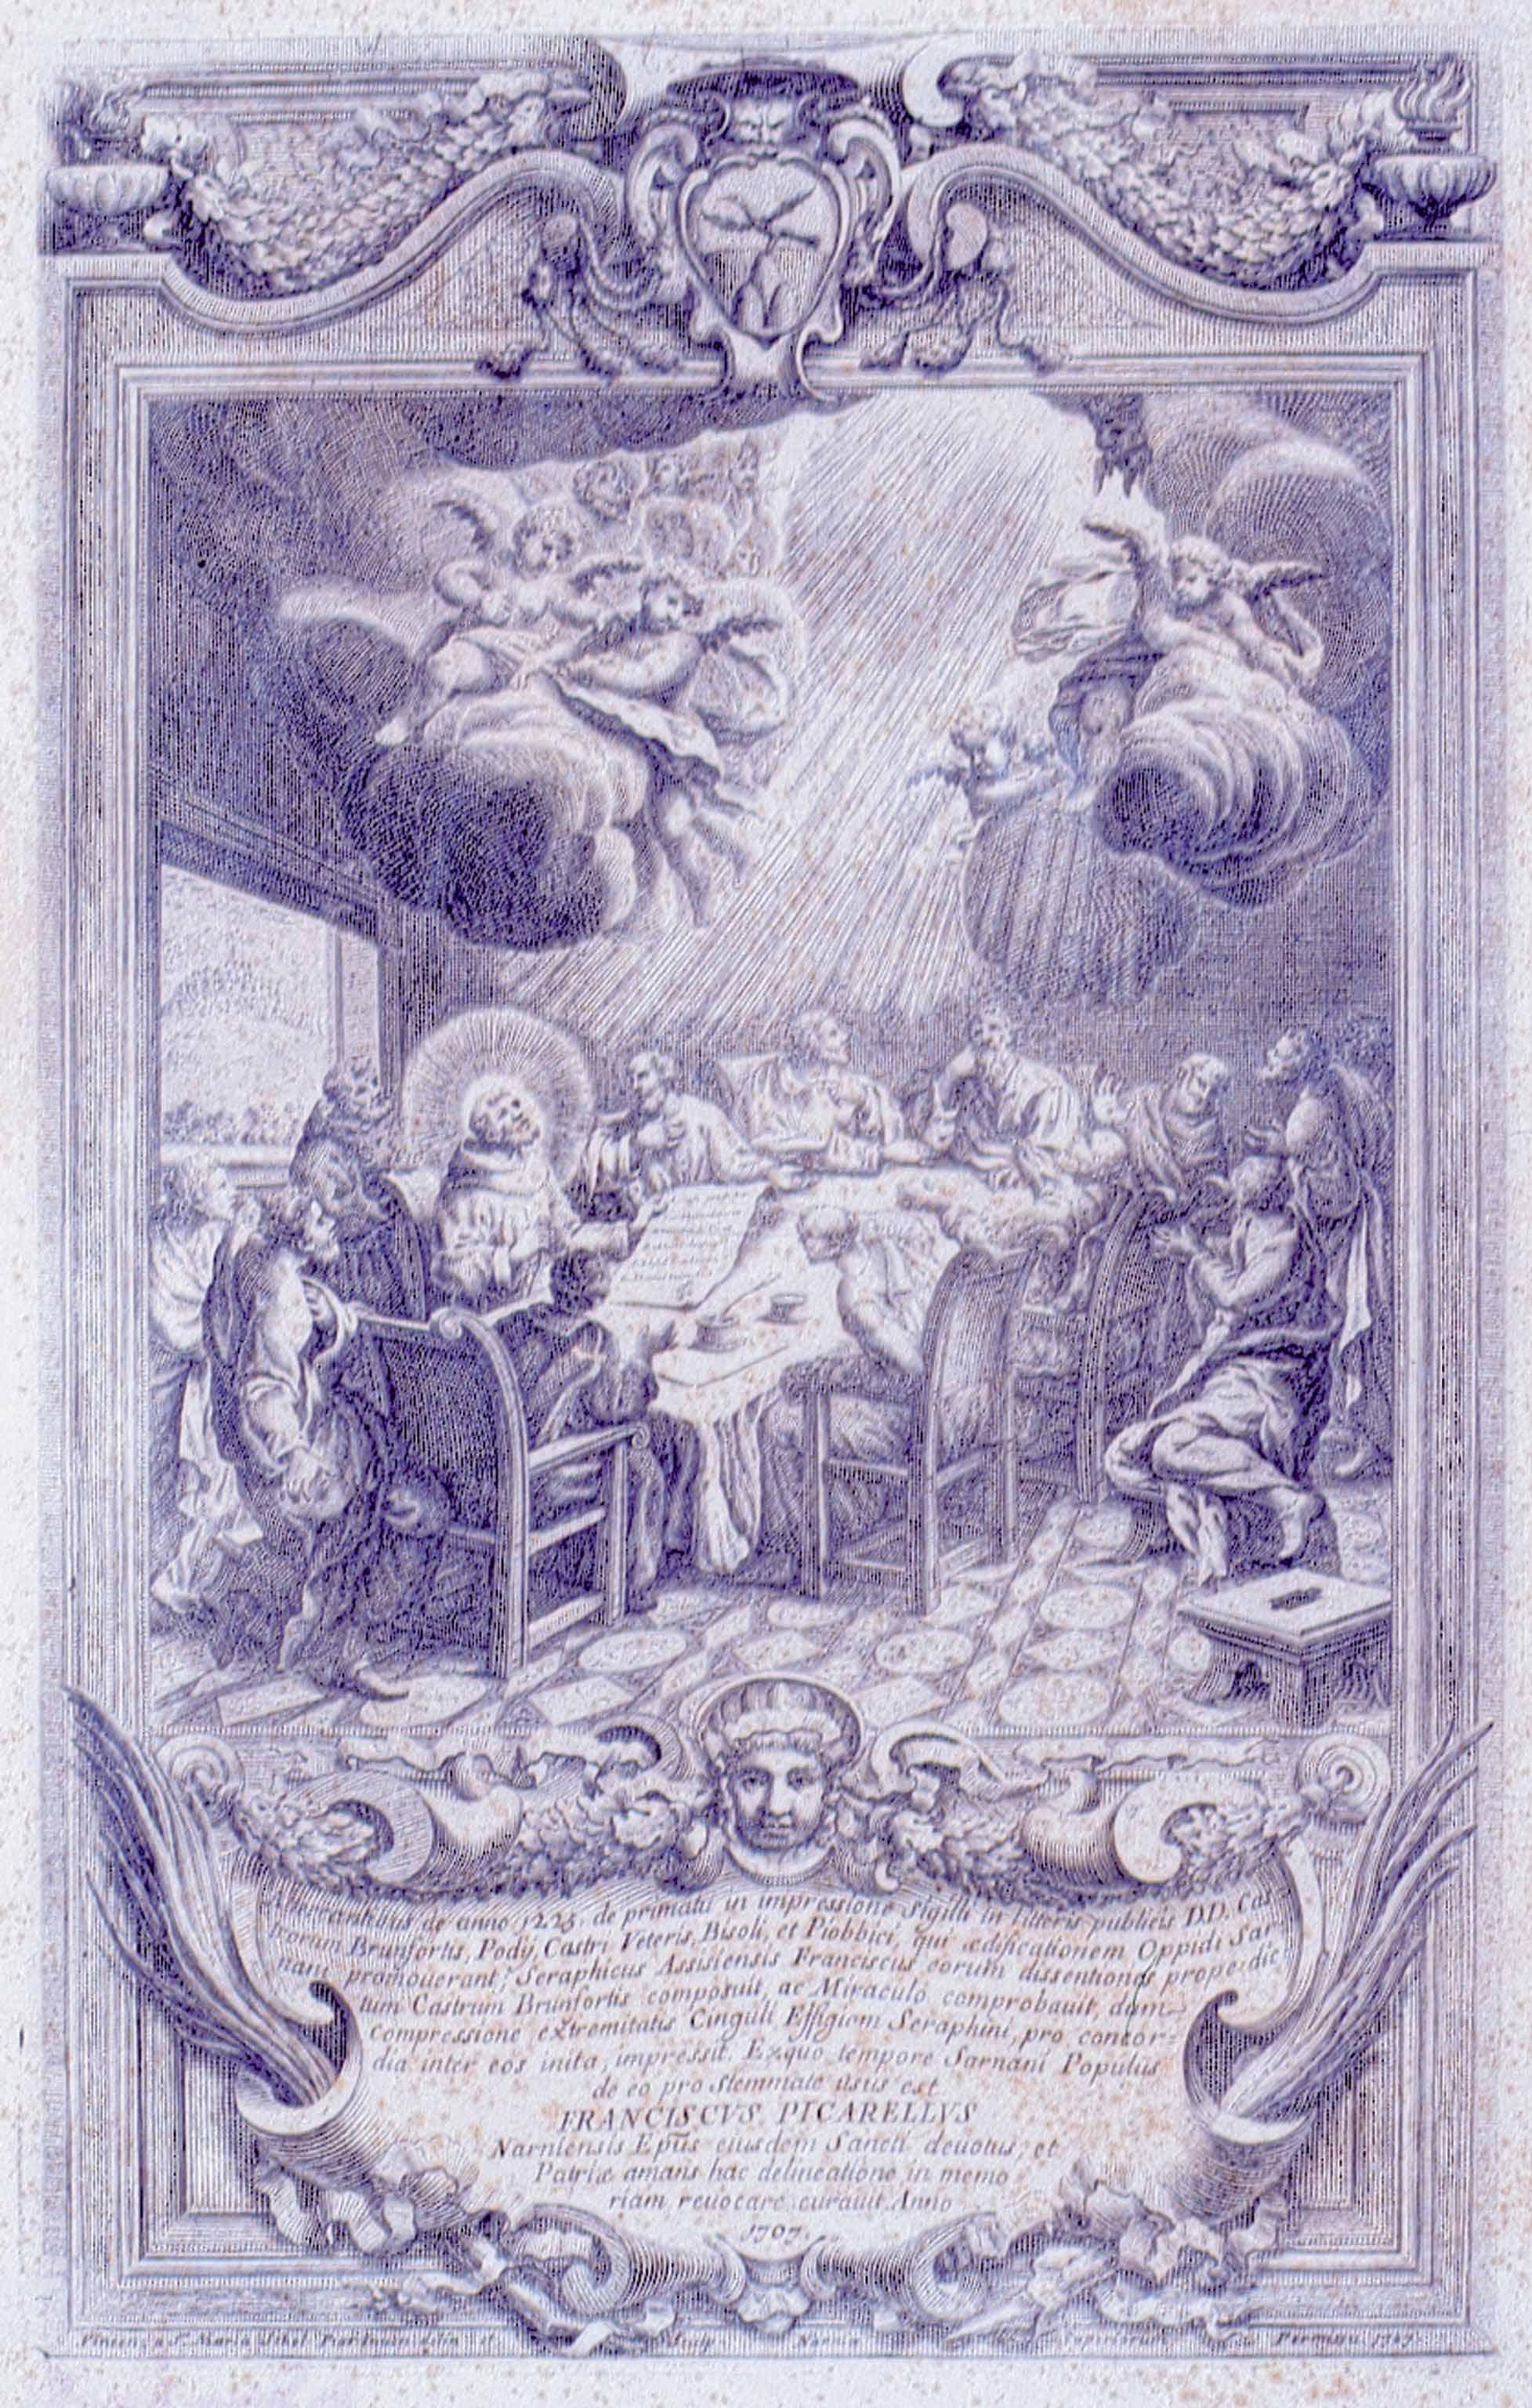 Museo di Sarnano: Francesco Picarello, San Francesco disegna lo stemma